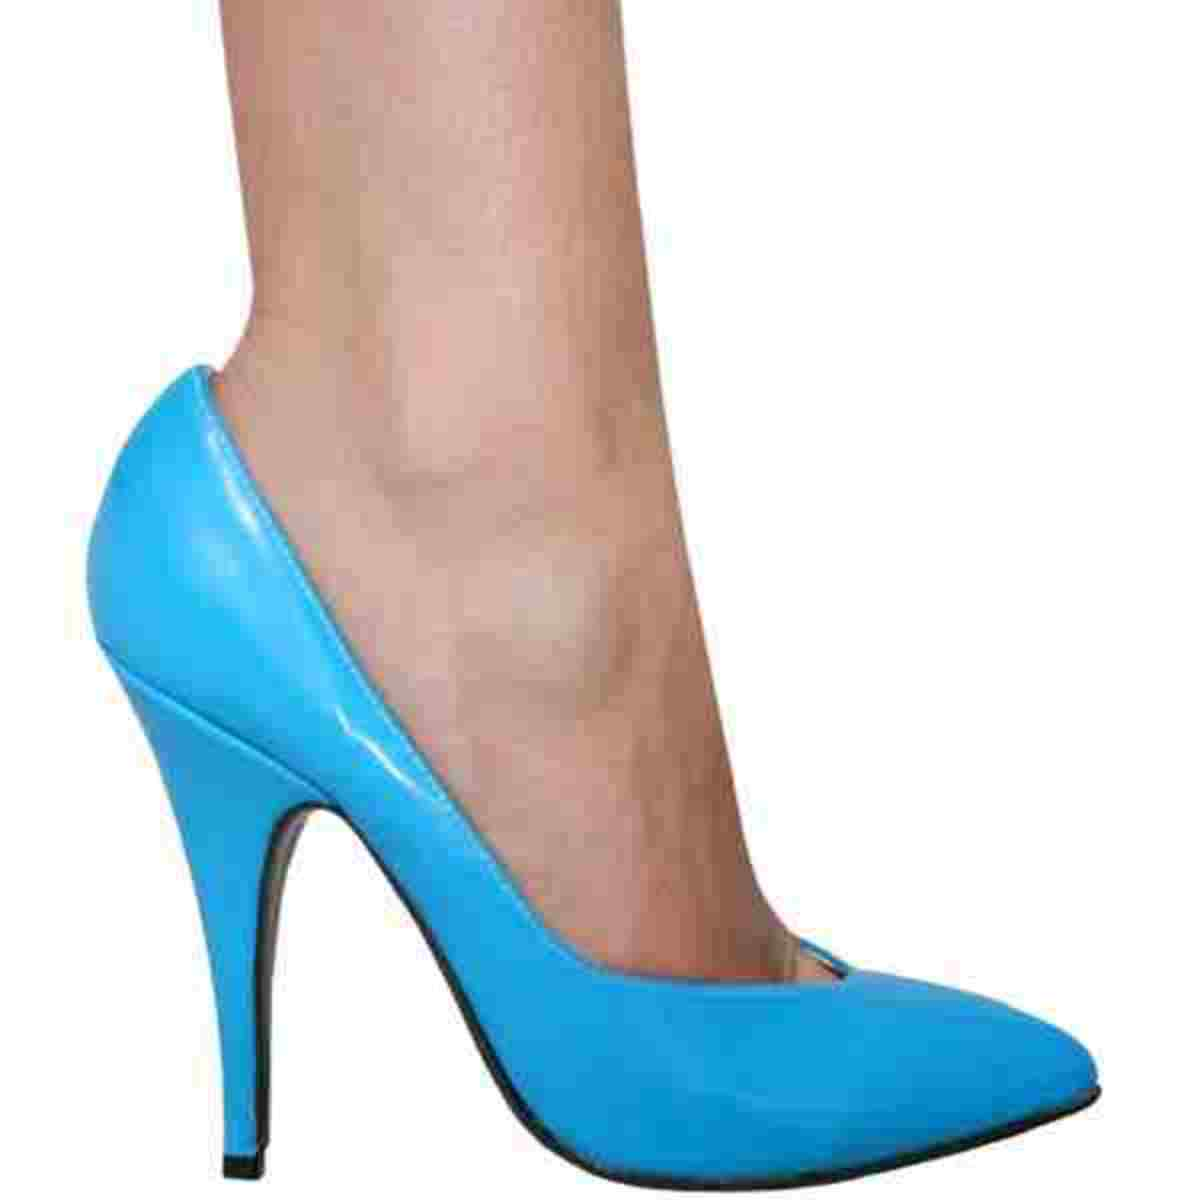 High Heels are a not a good idea! heelsforyou.com